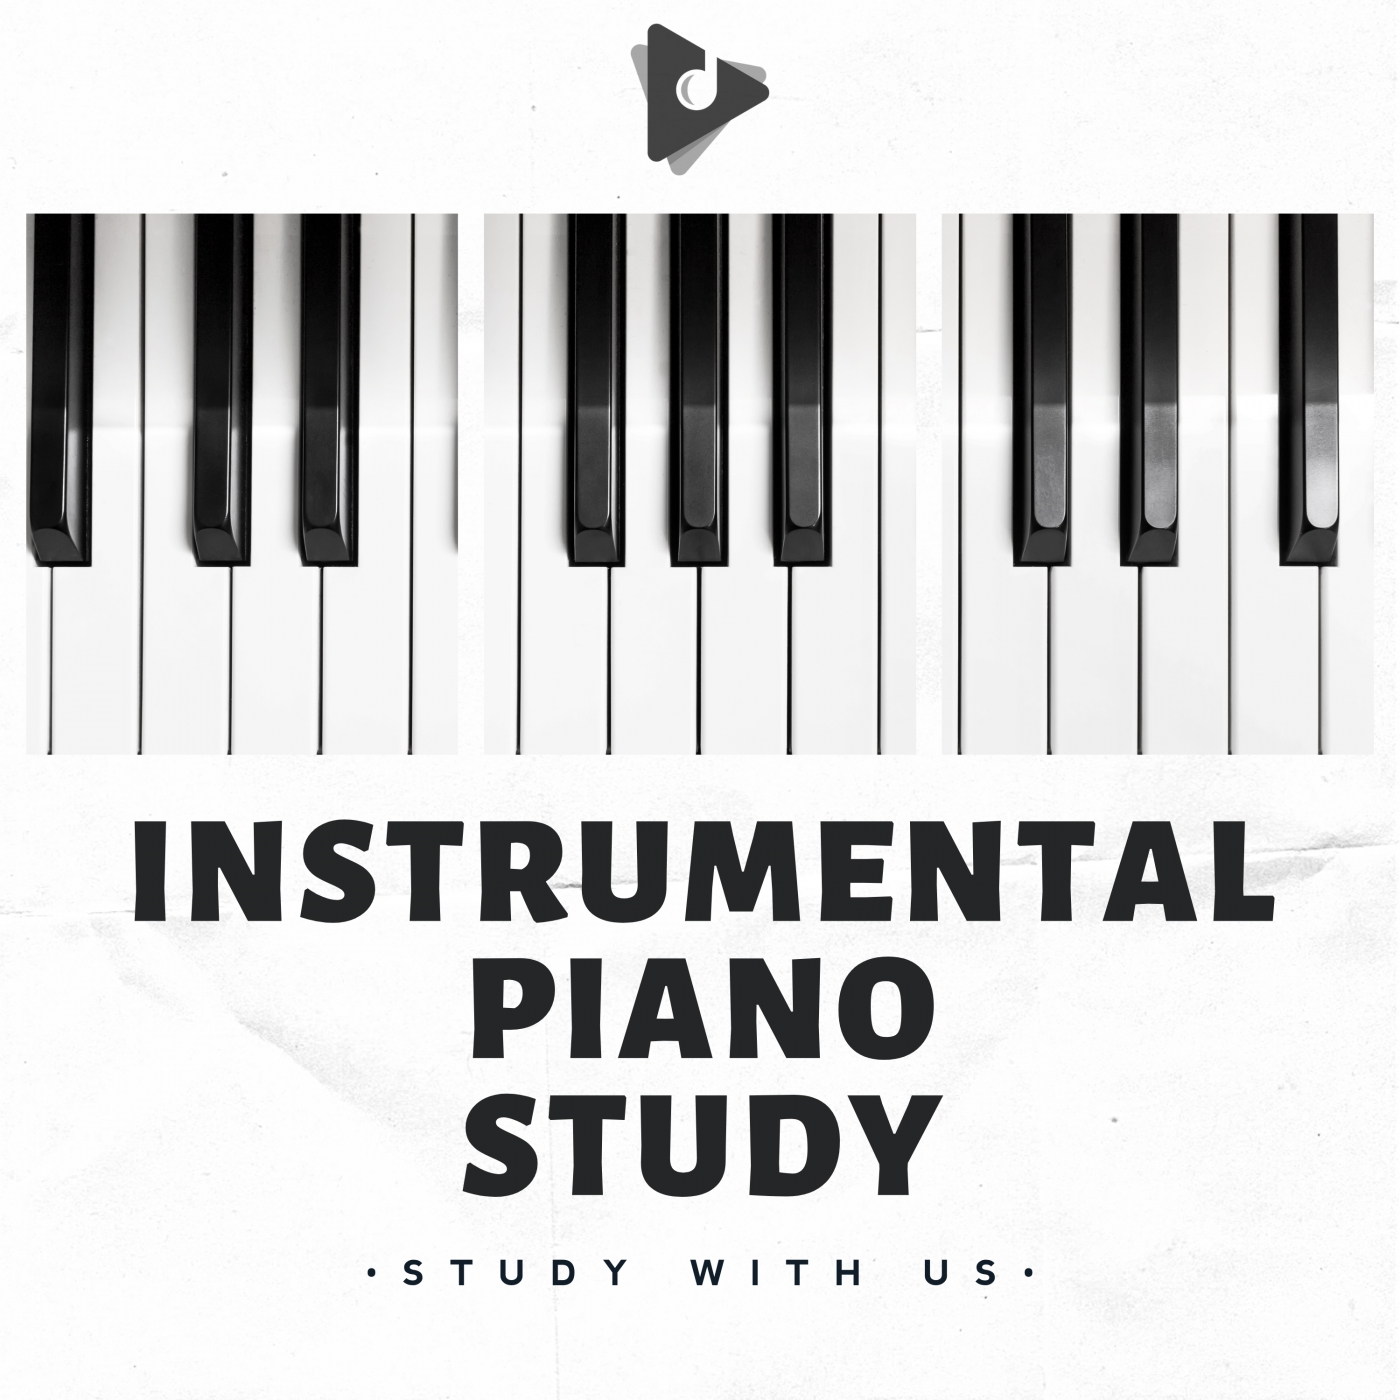 Instrumental Piano Study